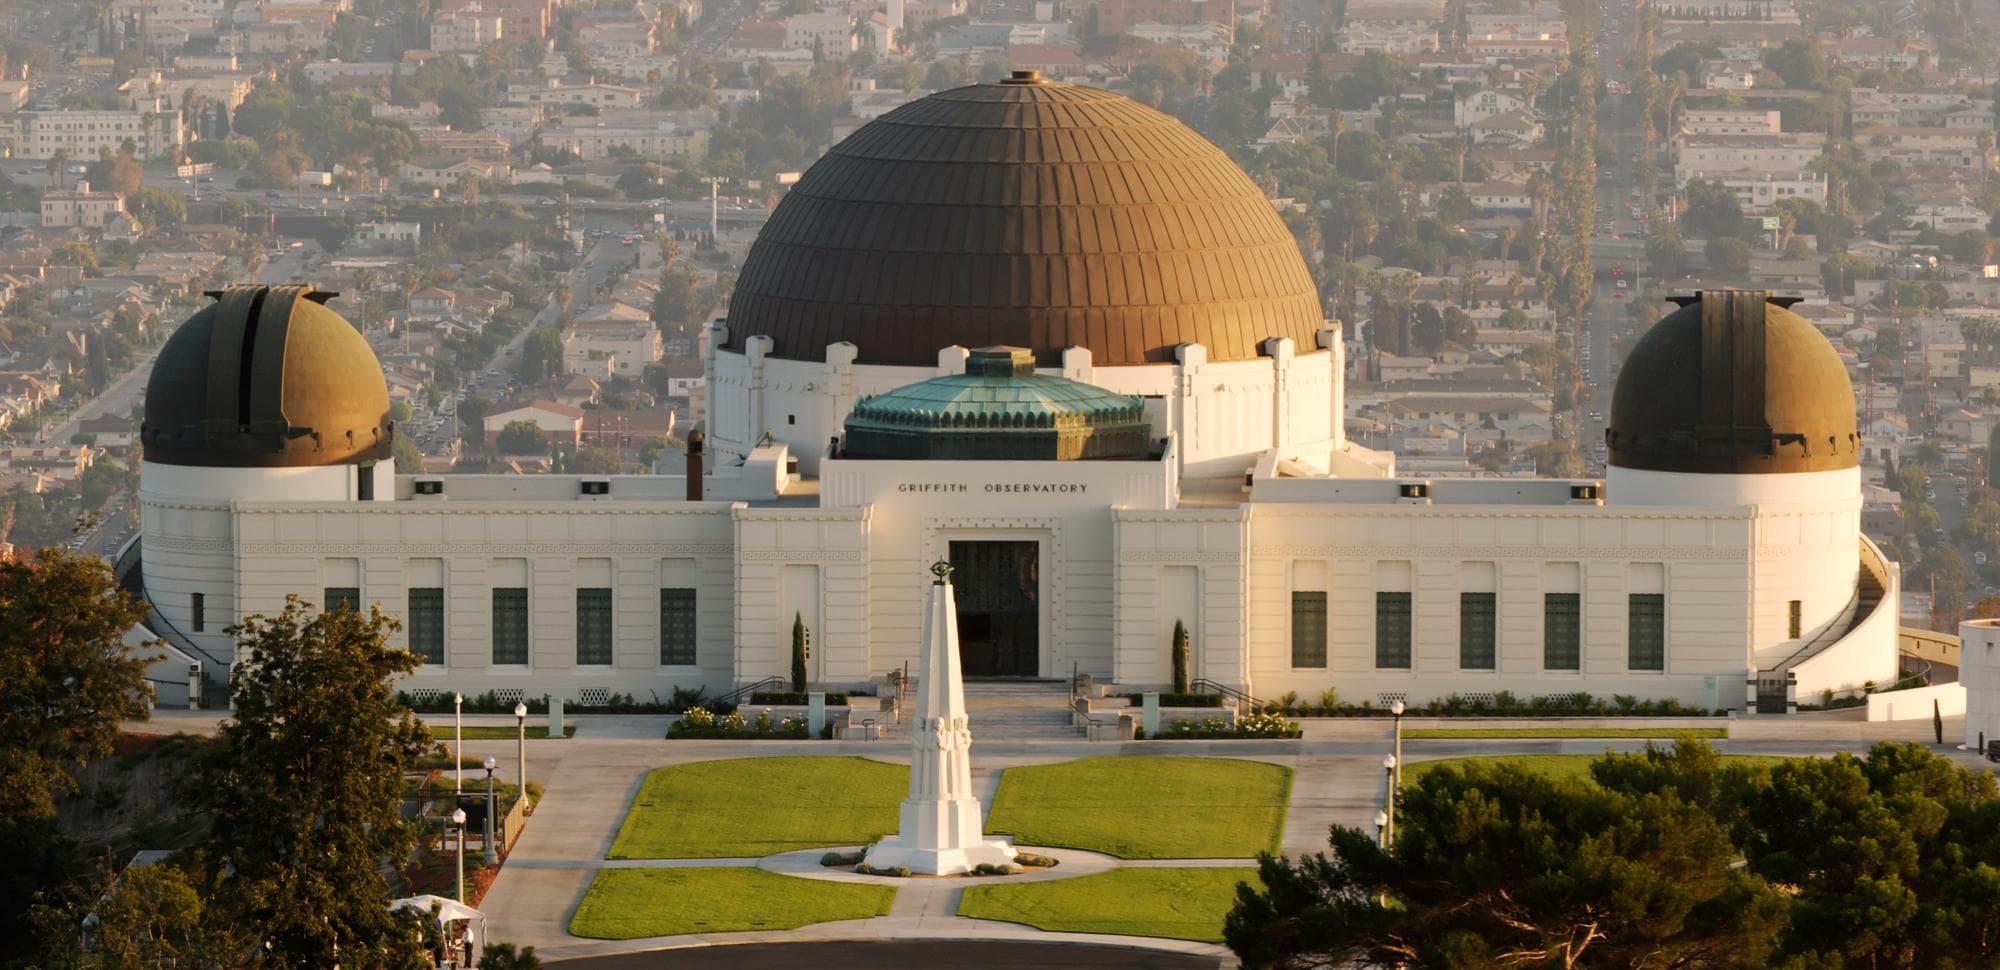 Random Top Must-See Attractions in Los Angeles